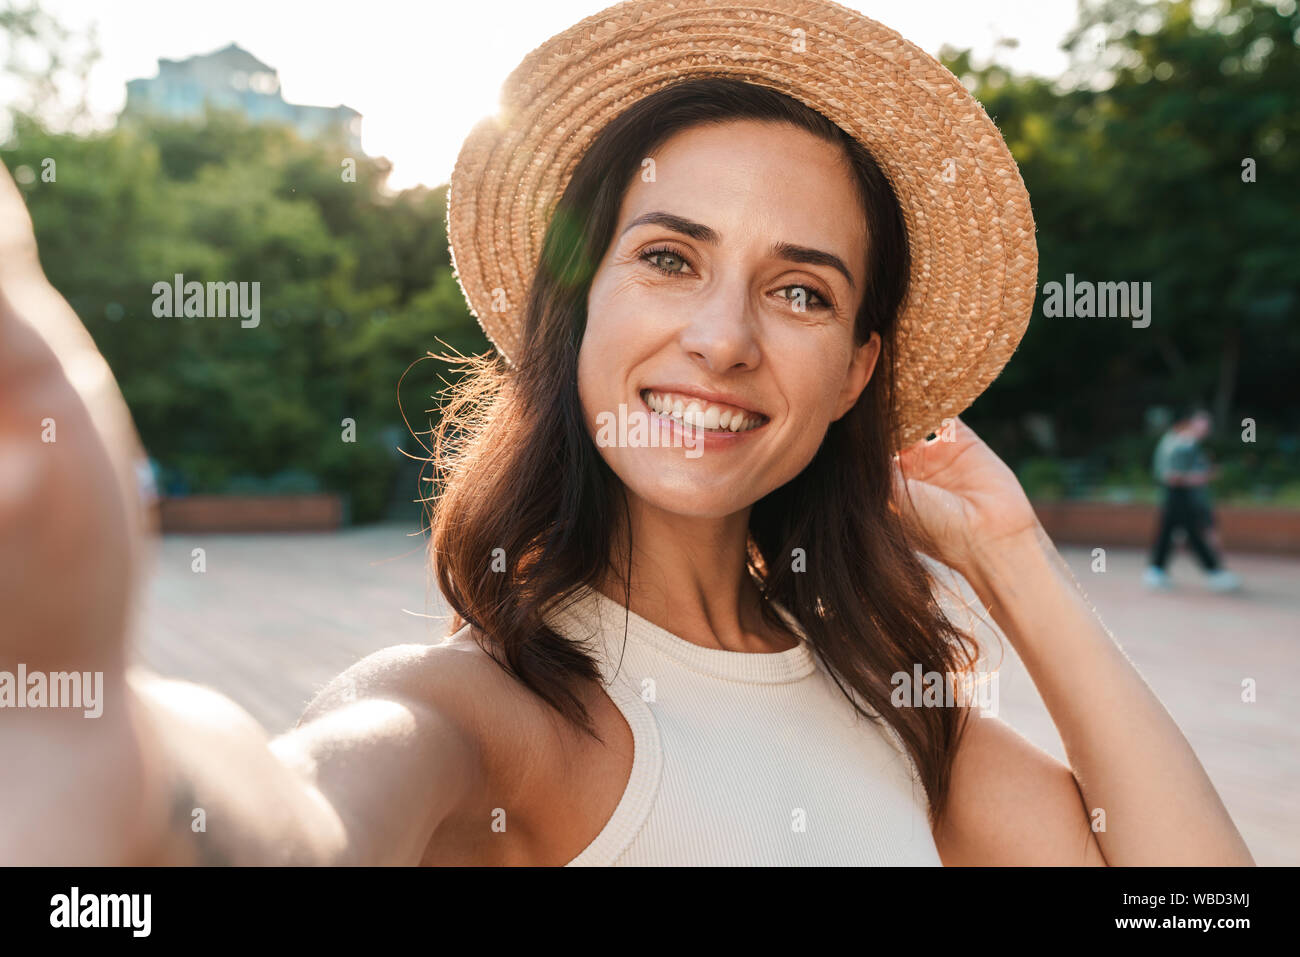 Frau bildschöne FrauenPorno hot